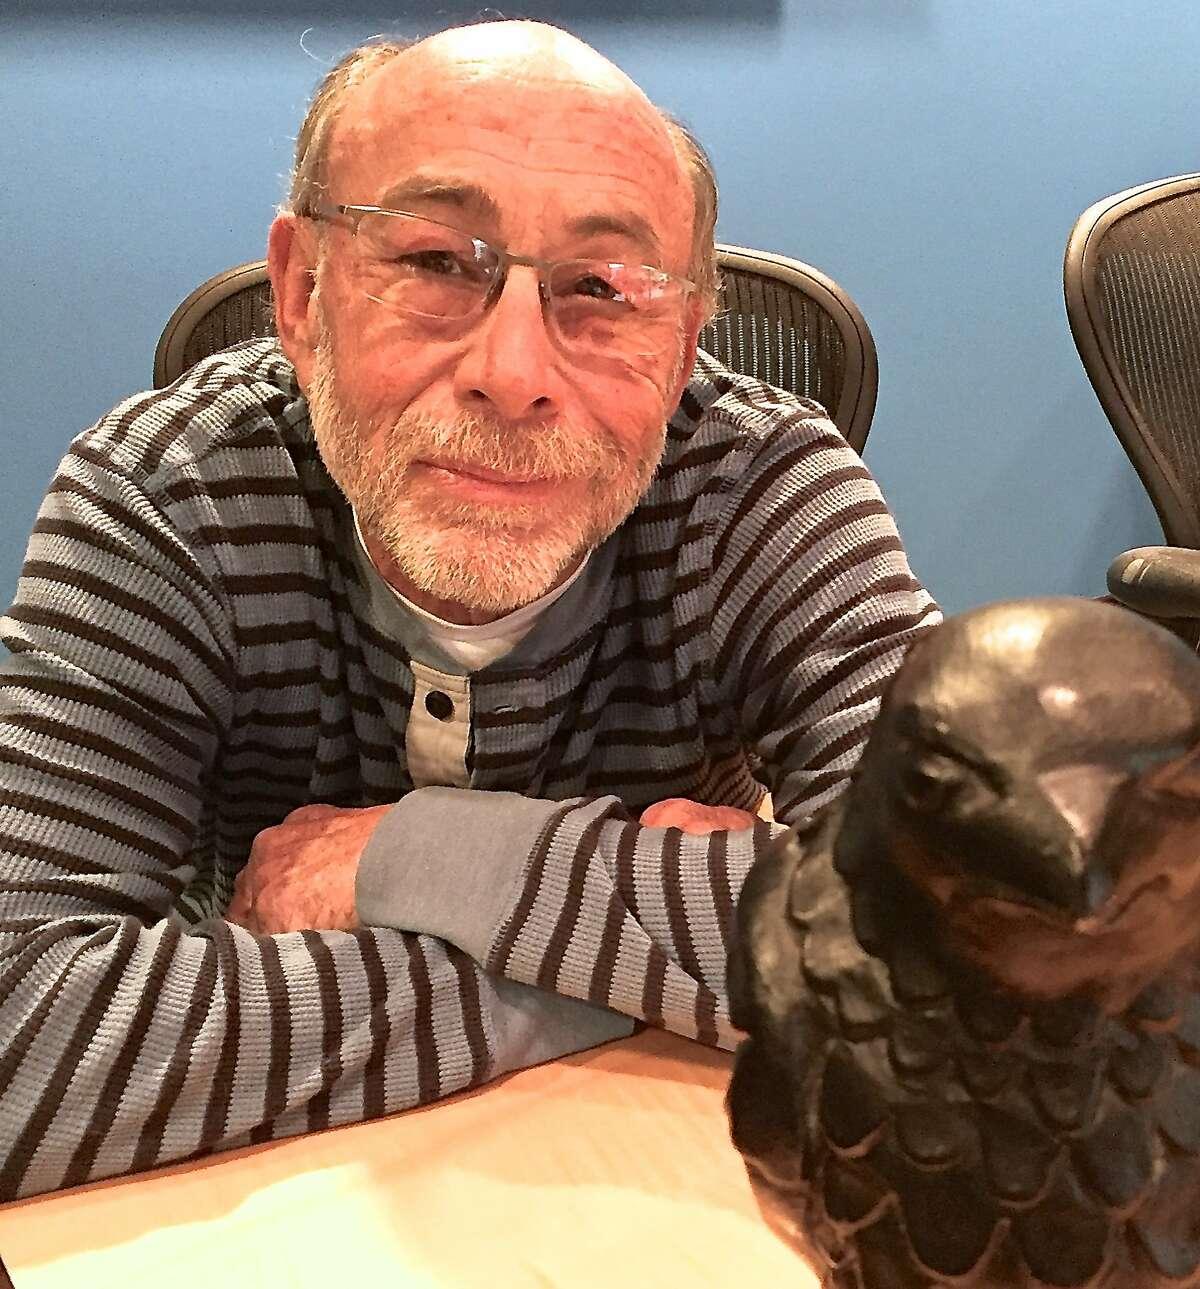 Steve Kushman, head of the California Historical Radio Society